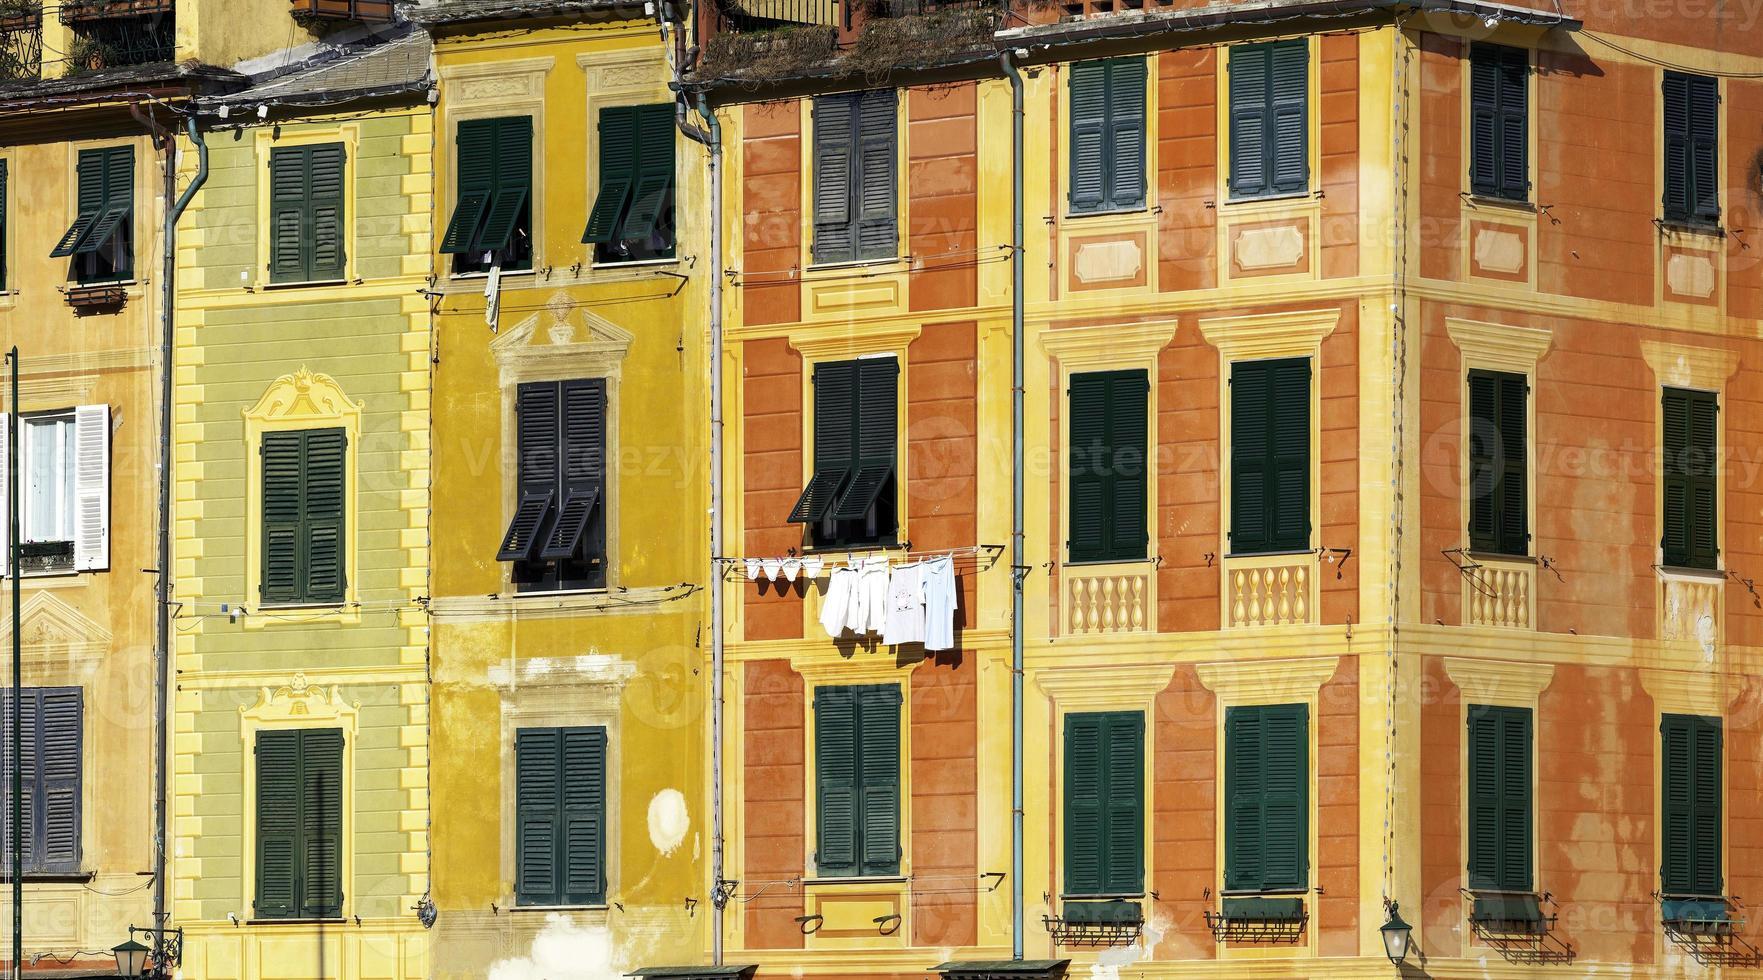 Portofino's houses detail. Color image photo